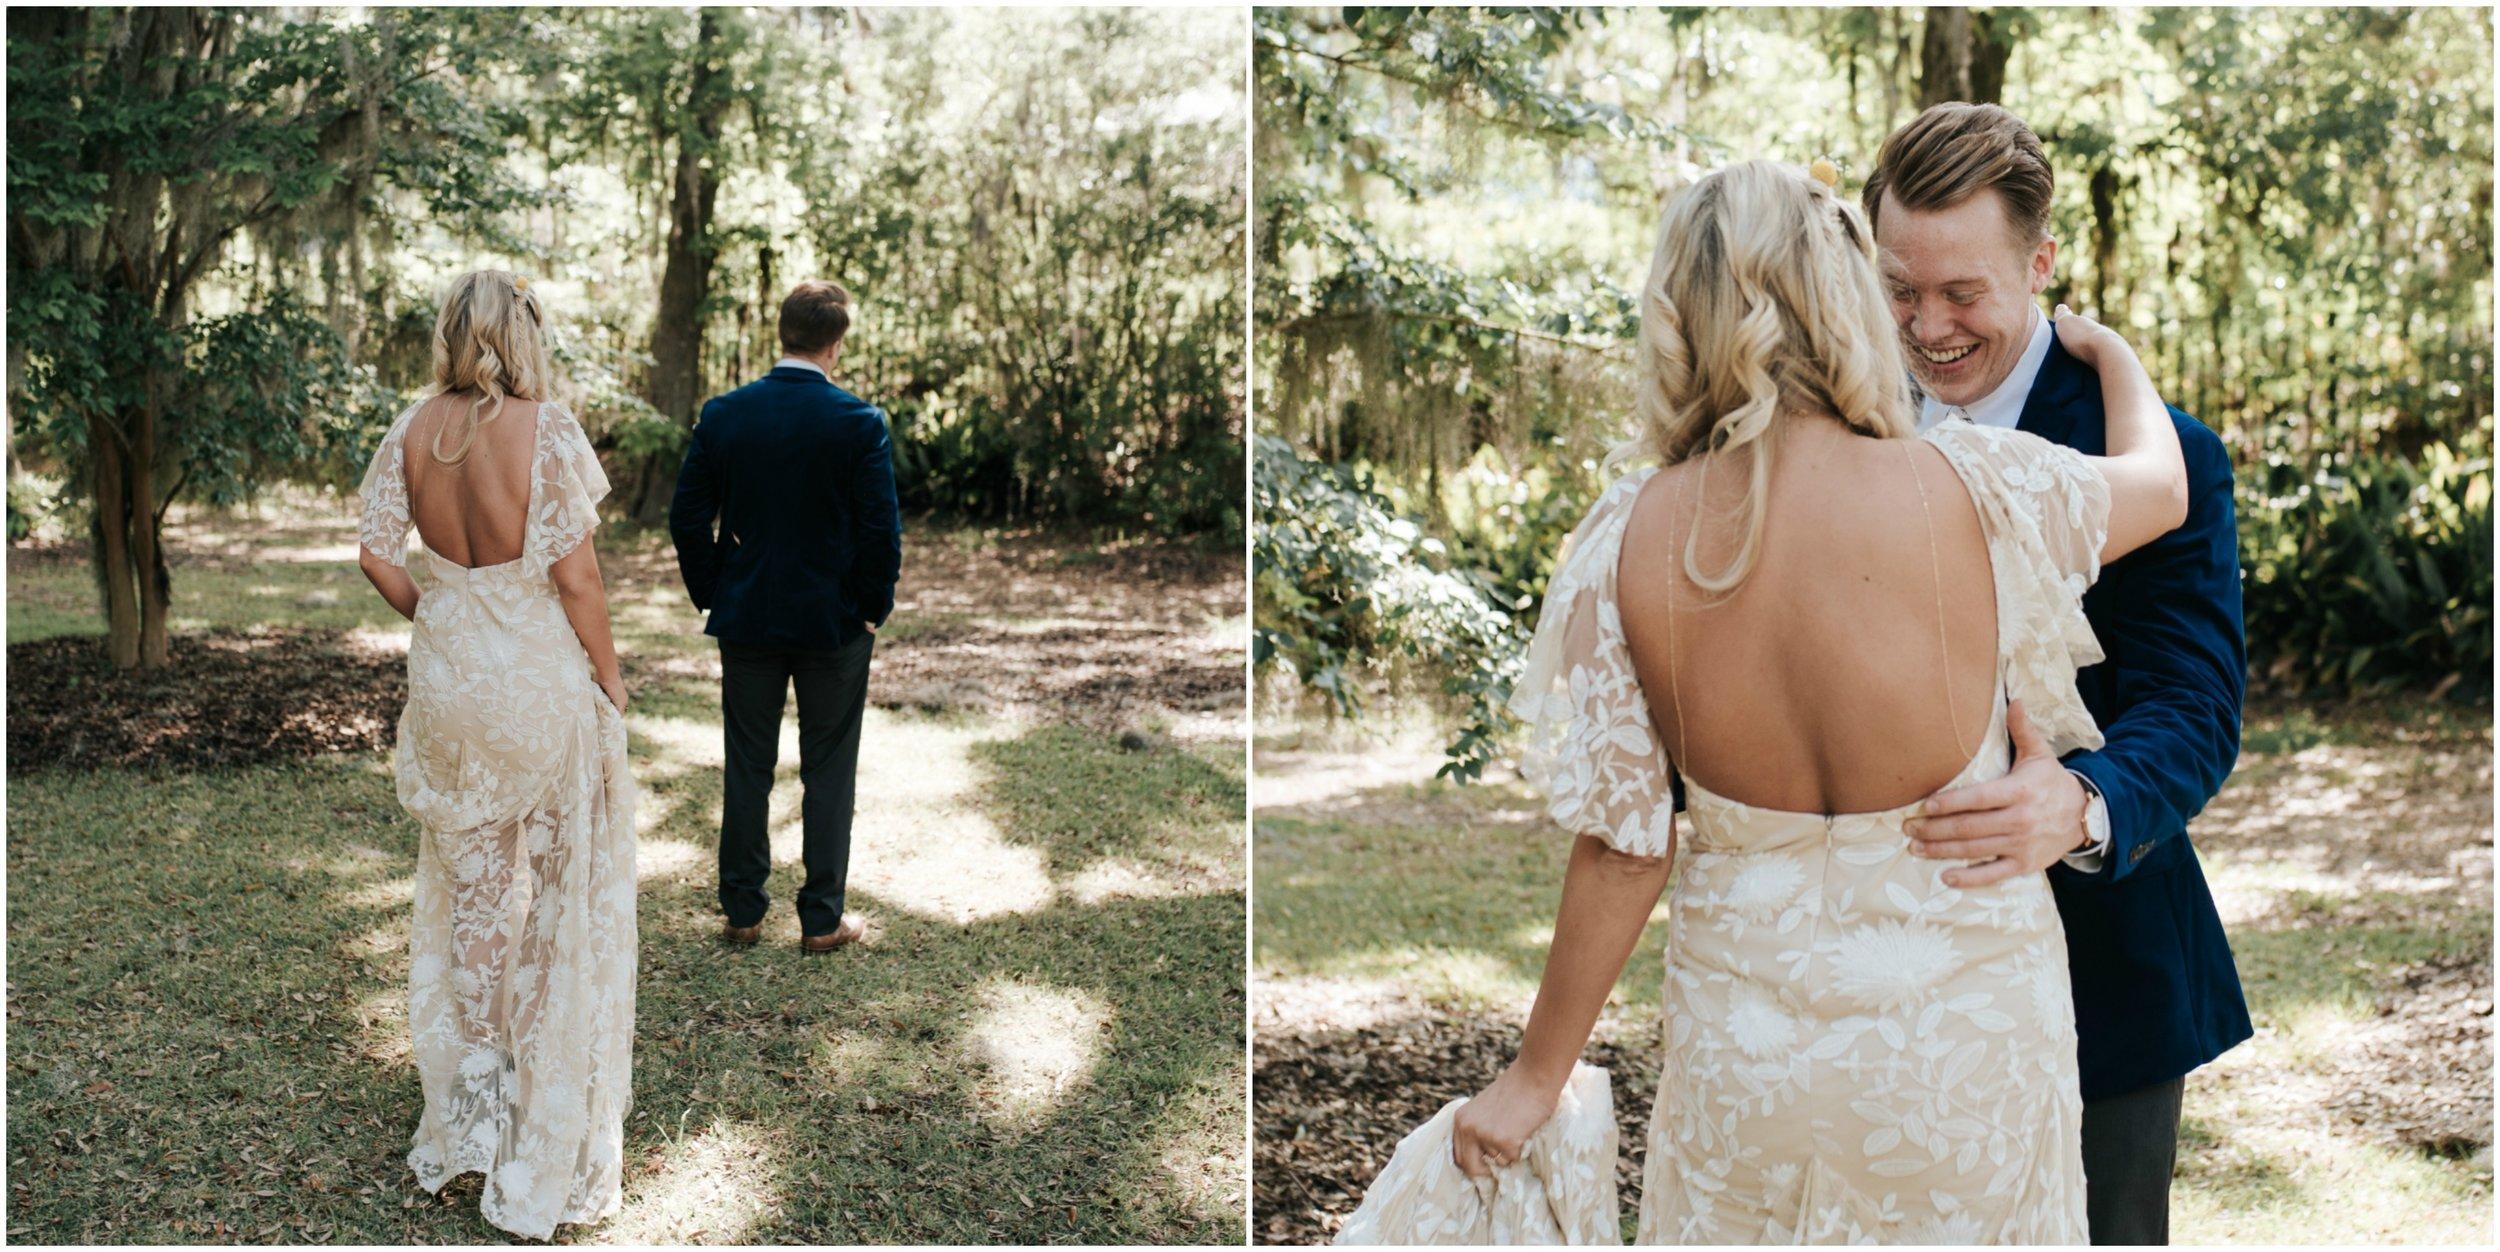 zayda-collin-wedding-first-look.jpg